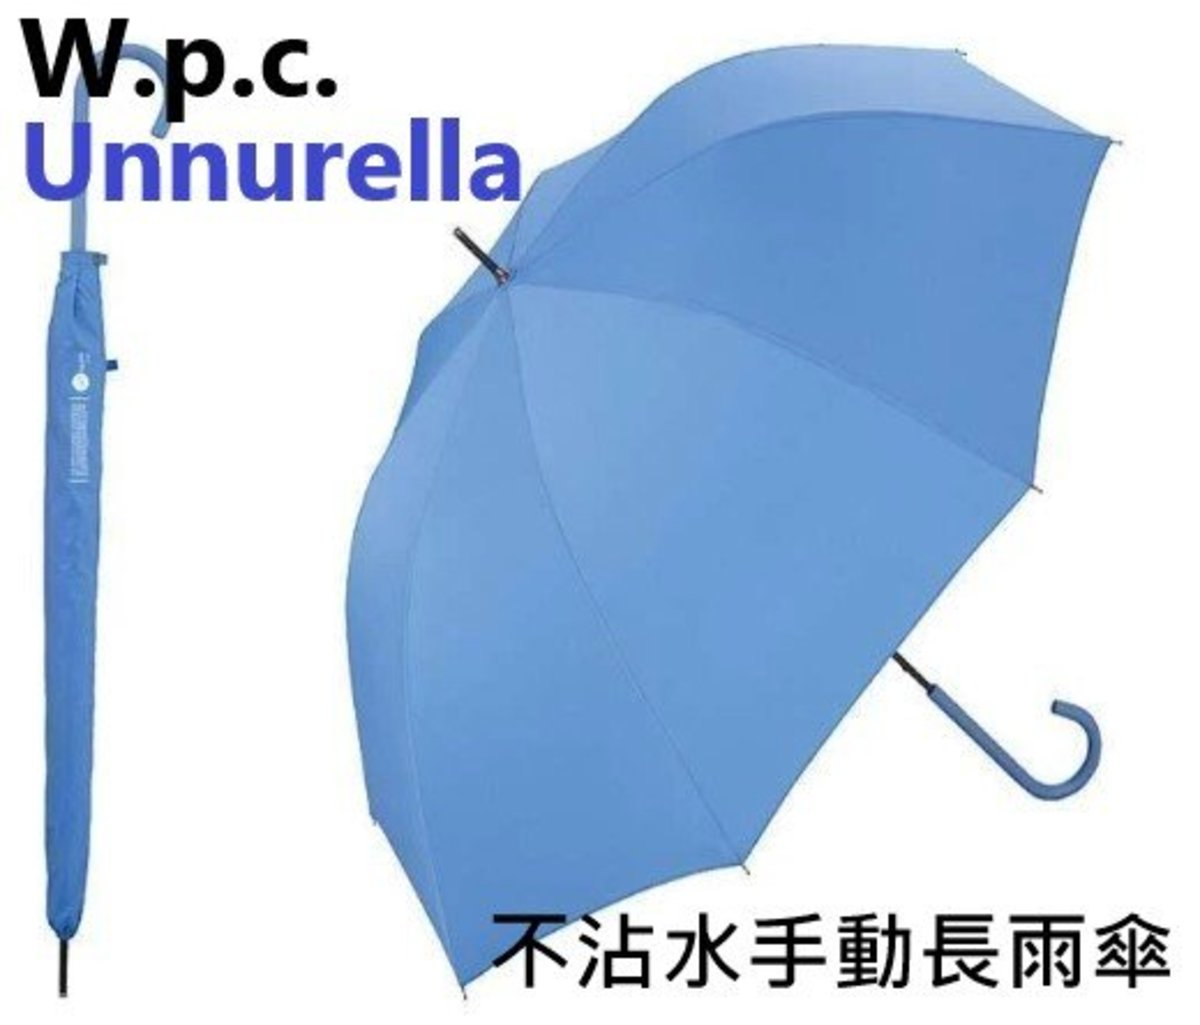 (UN-1006) Unnurella Long water resistance umbrella - Blue